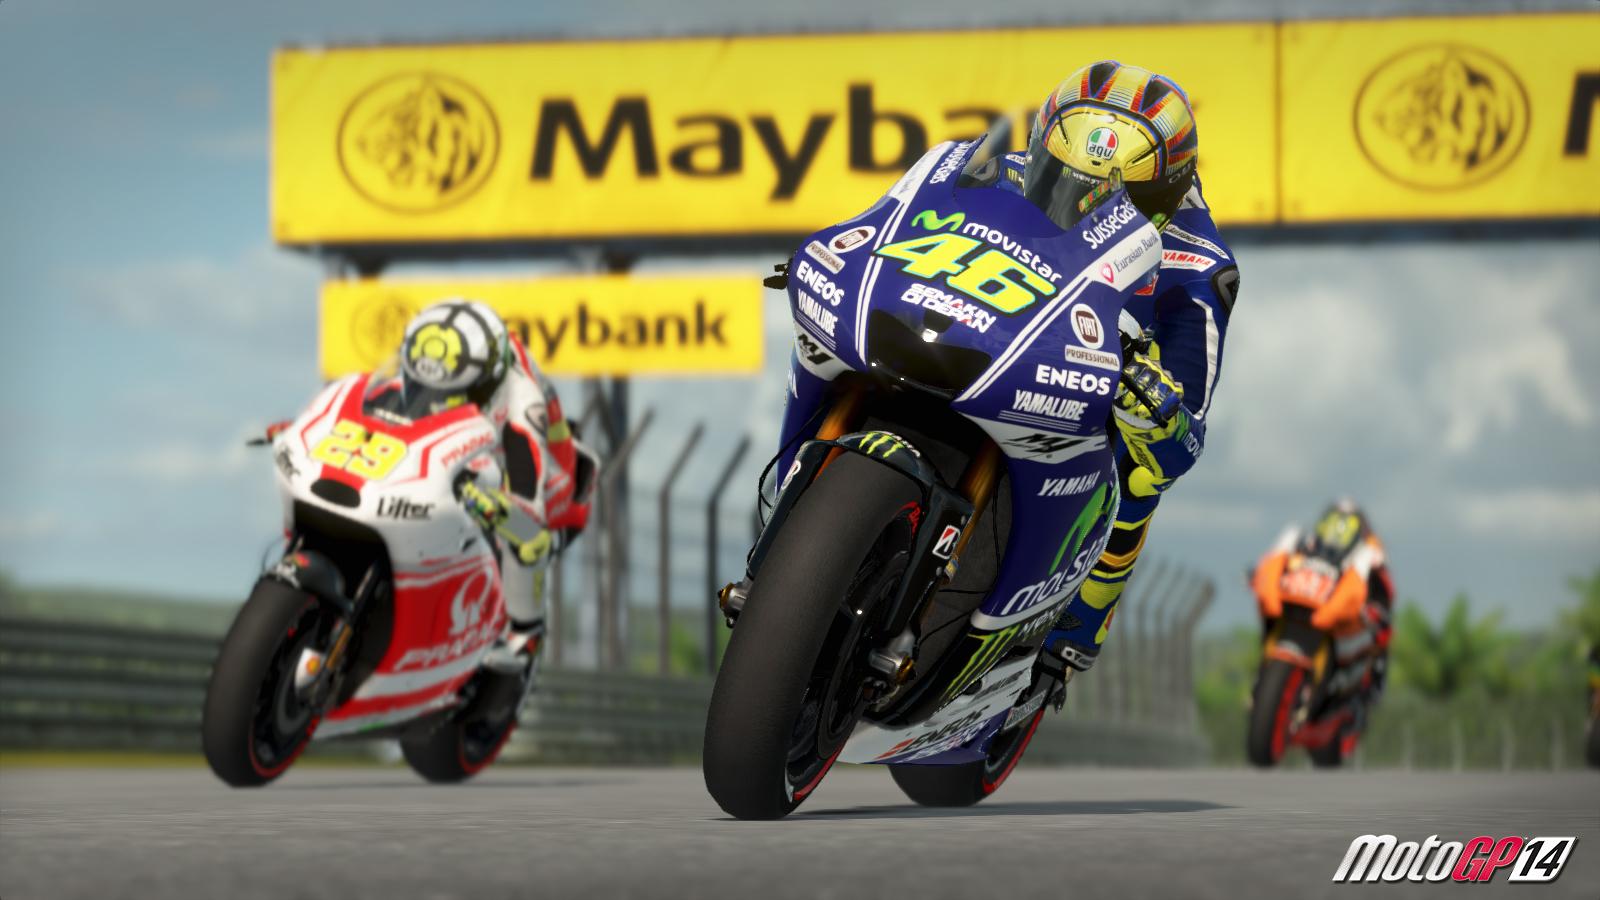 MotoGP 14 Multilenguaje ESPAÑOL XBOX 360 (Región NTSC-U/PAL) 11